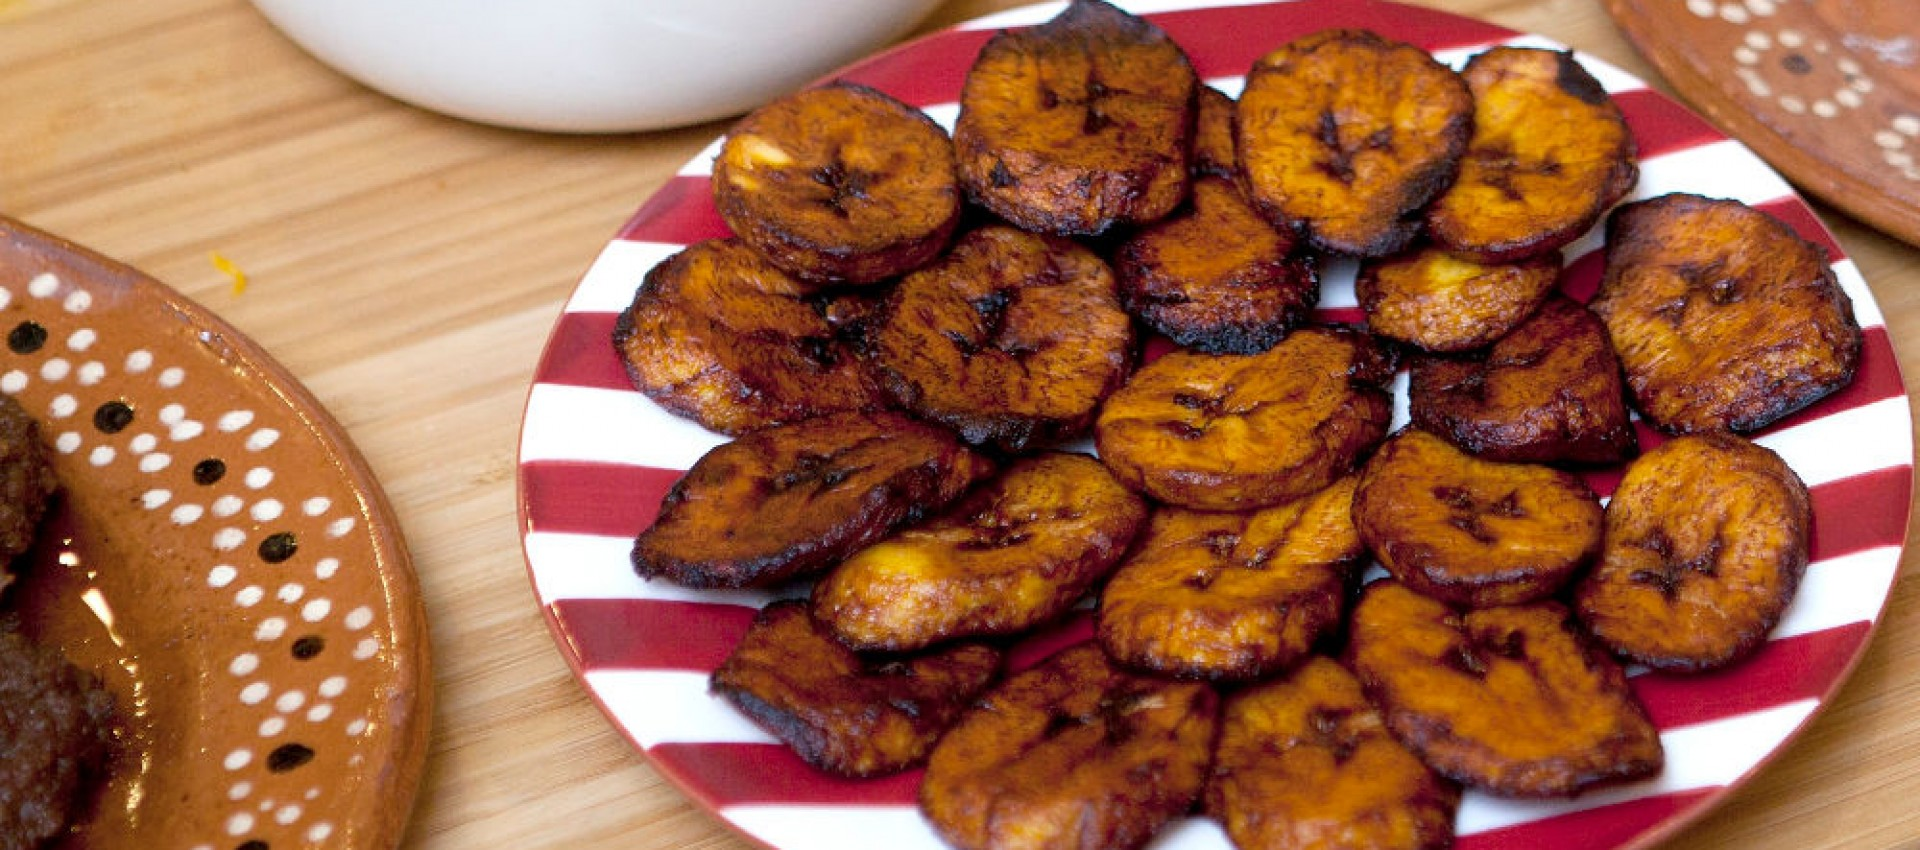 Banana Dessert Image